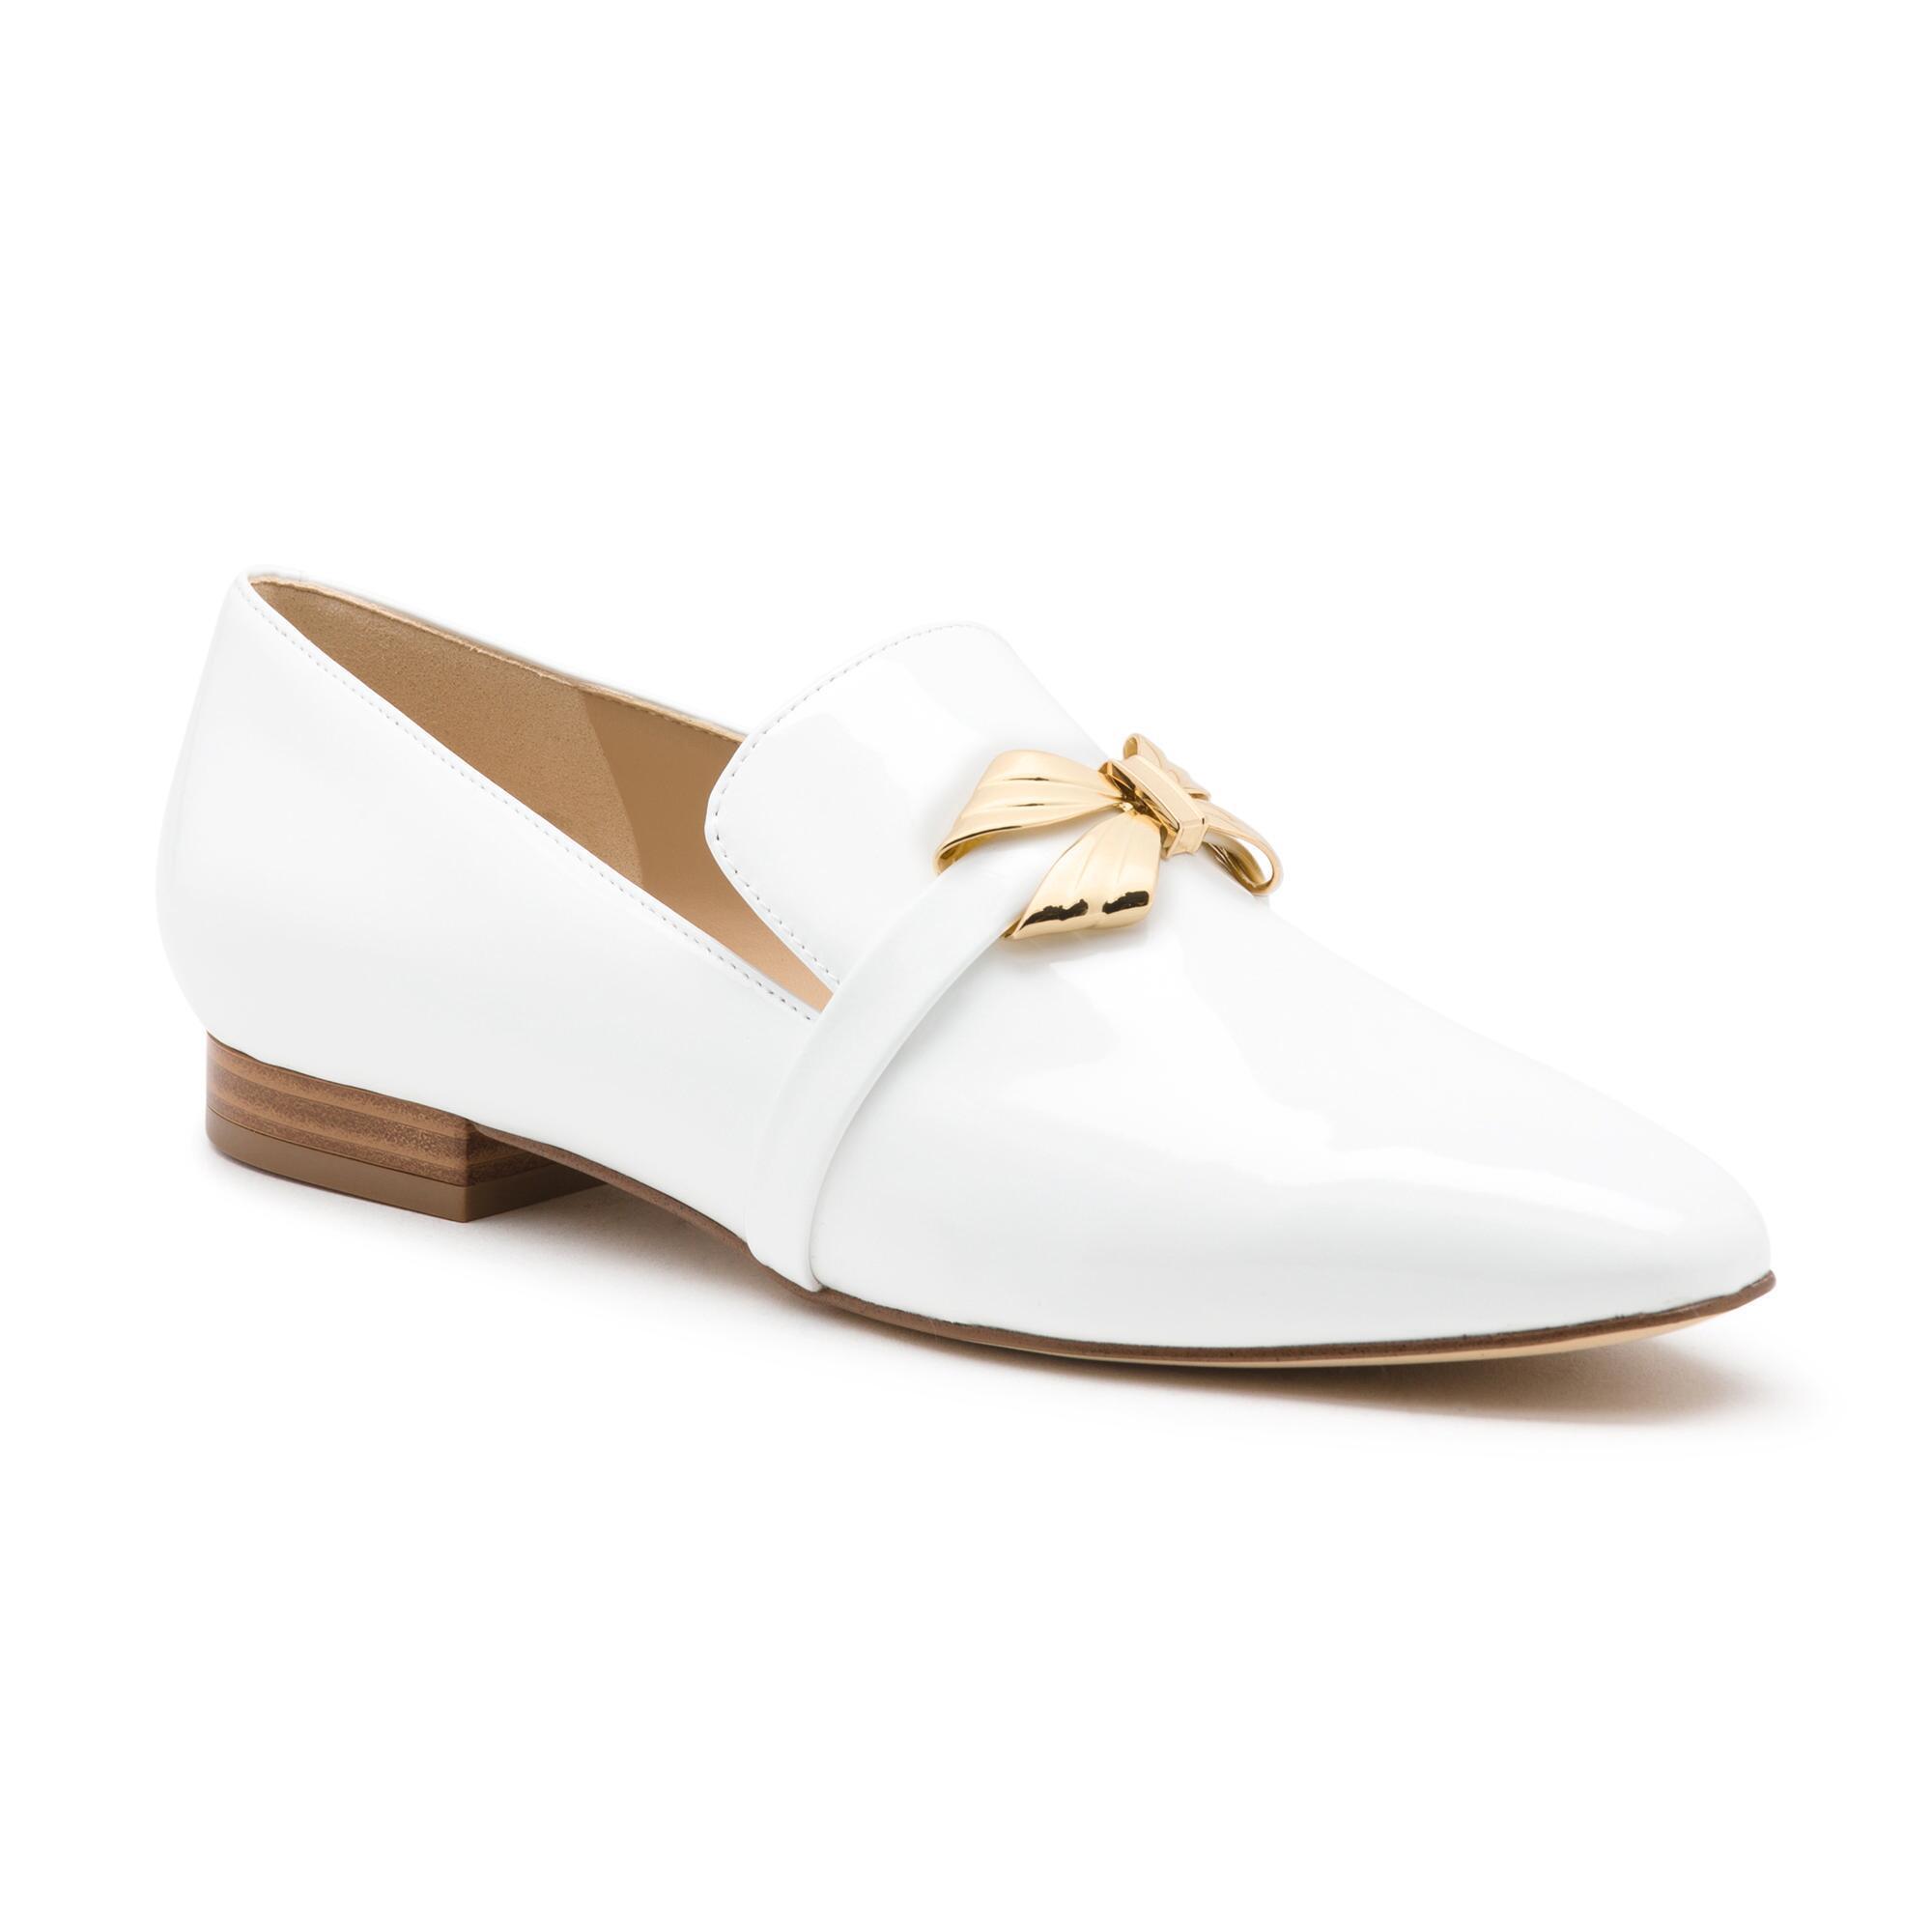 87b8b4155ed Lyst - Karl Lagerfeld Naomi Slip On Loafer in White